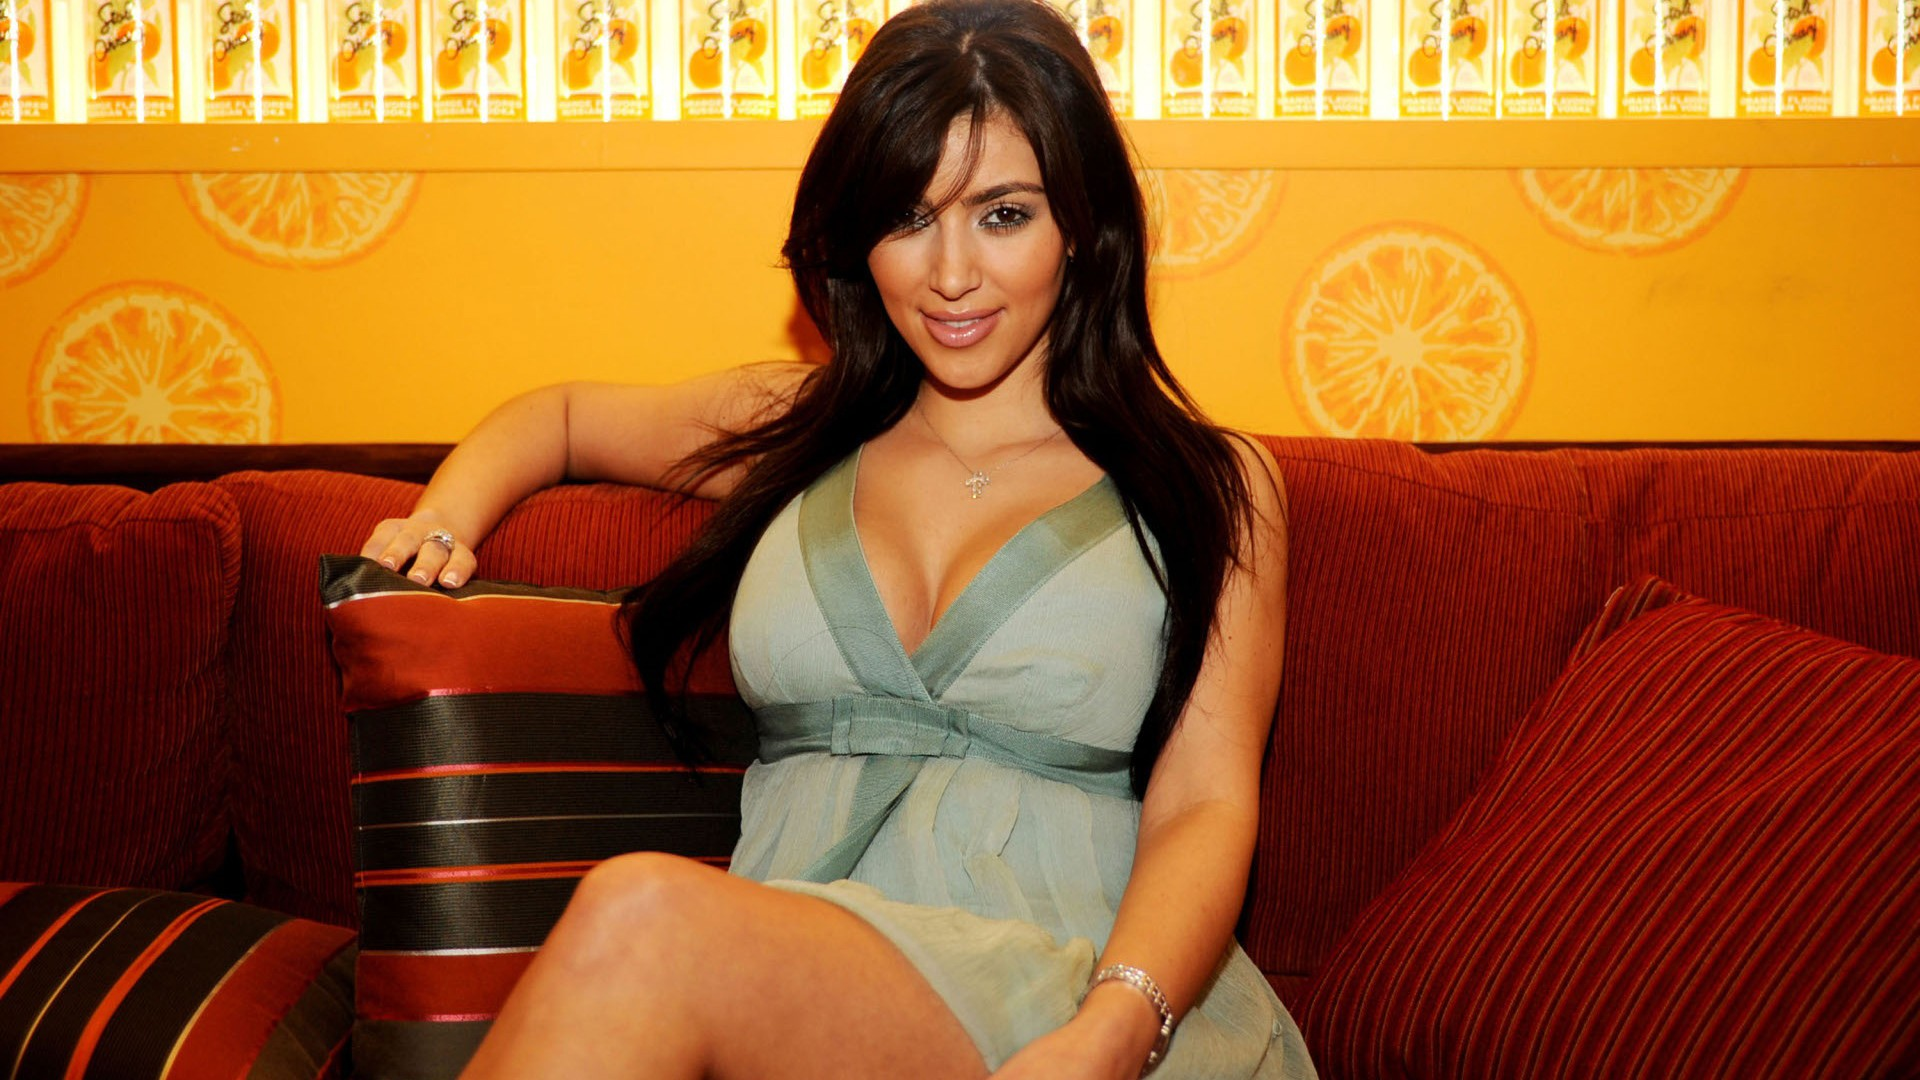 Kim Kardashian 2013 HD Wallpaper of Celebrities   hdwallpaper2013com 1920x1080